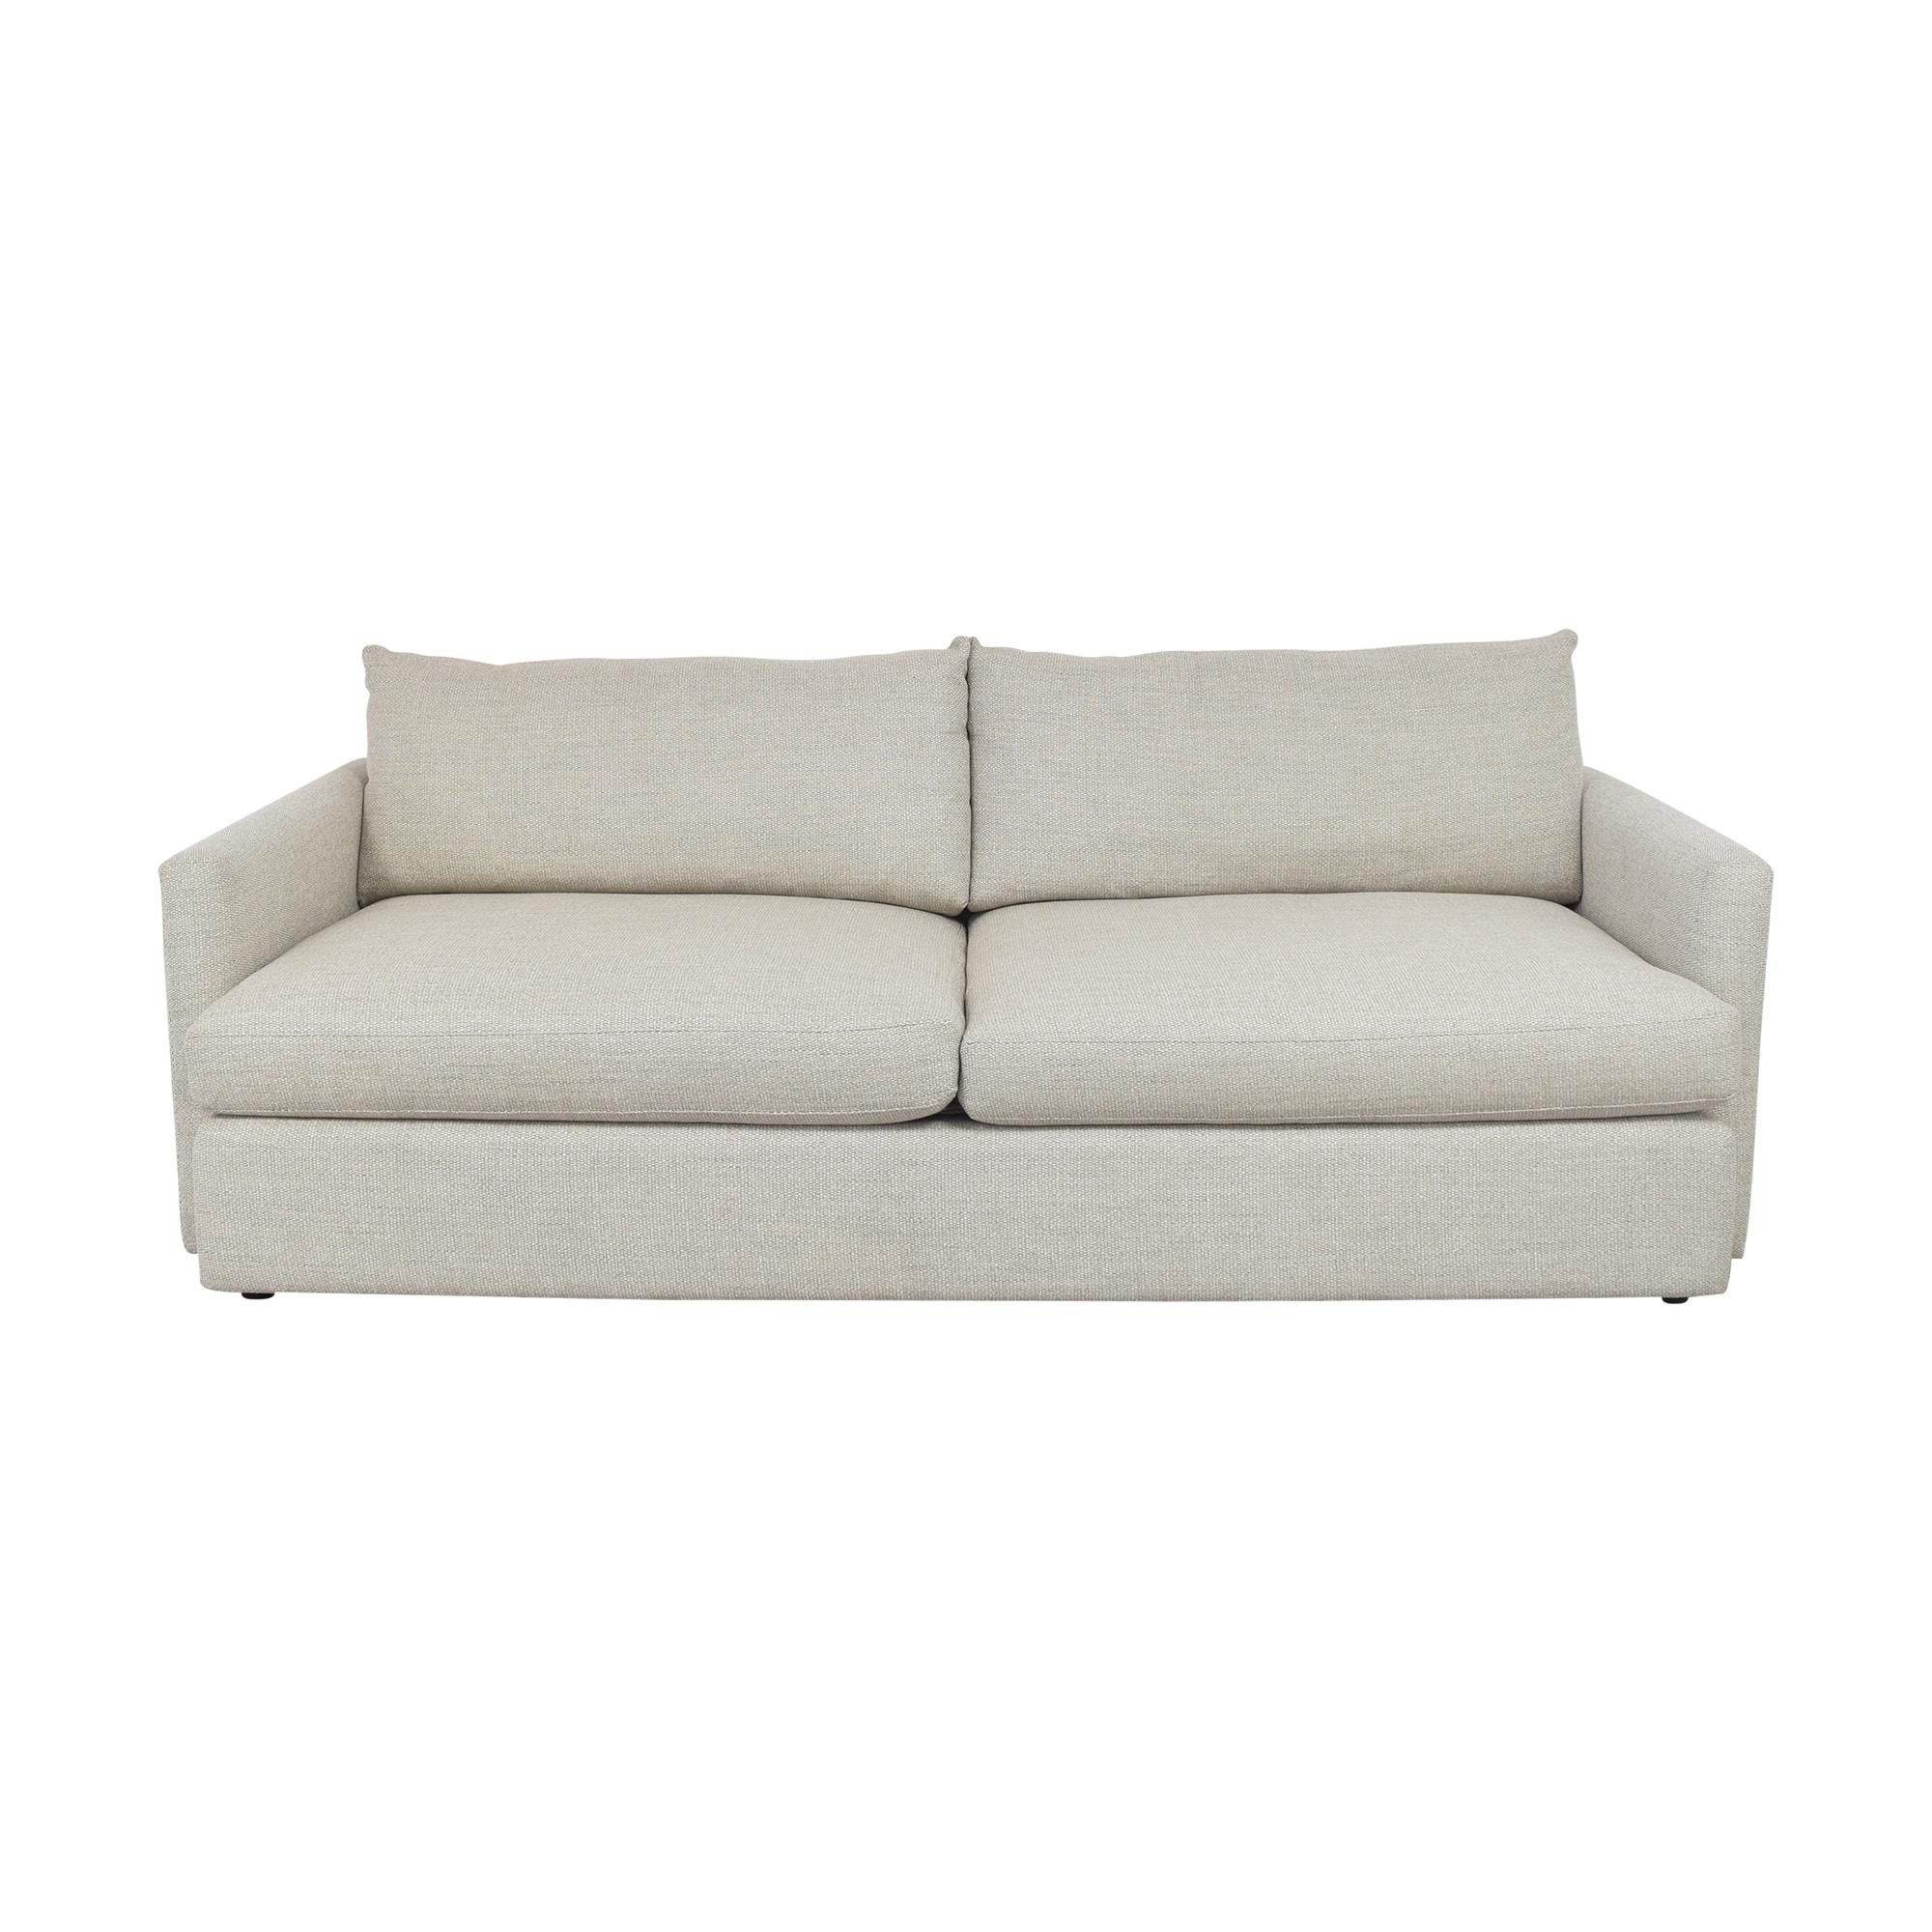 Crate & Barrel Crate & Barrel Lounge II Sofa price